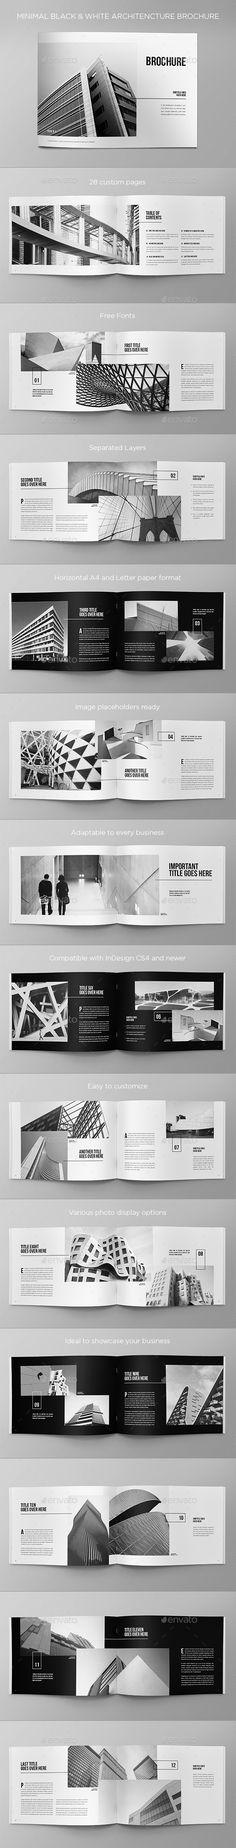 26 Ideas For Design Editorial Brochure Black White Travel Brochure Template, Bi Fold Brochure, Brochure Cover, Corporate Brochure, Business Brochure, Corporate Design, Brochure Design, Portfolio Covers, Portfolio Design